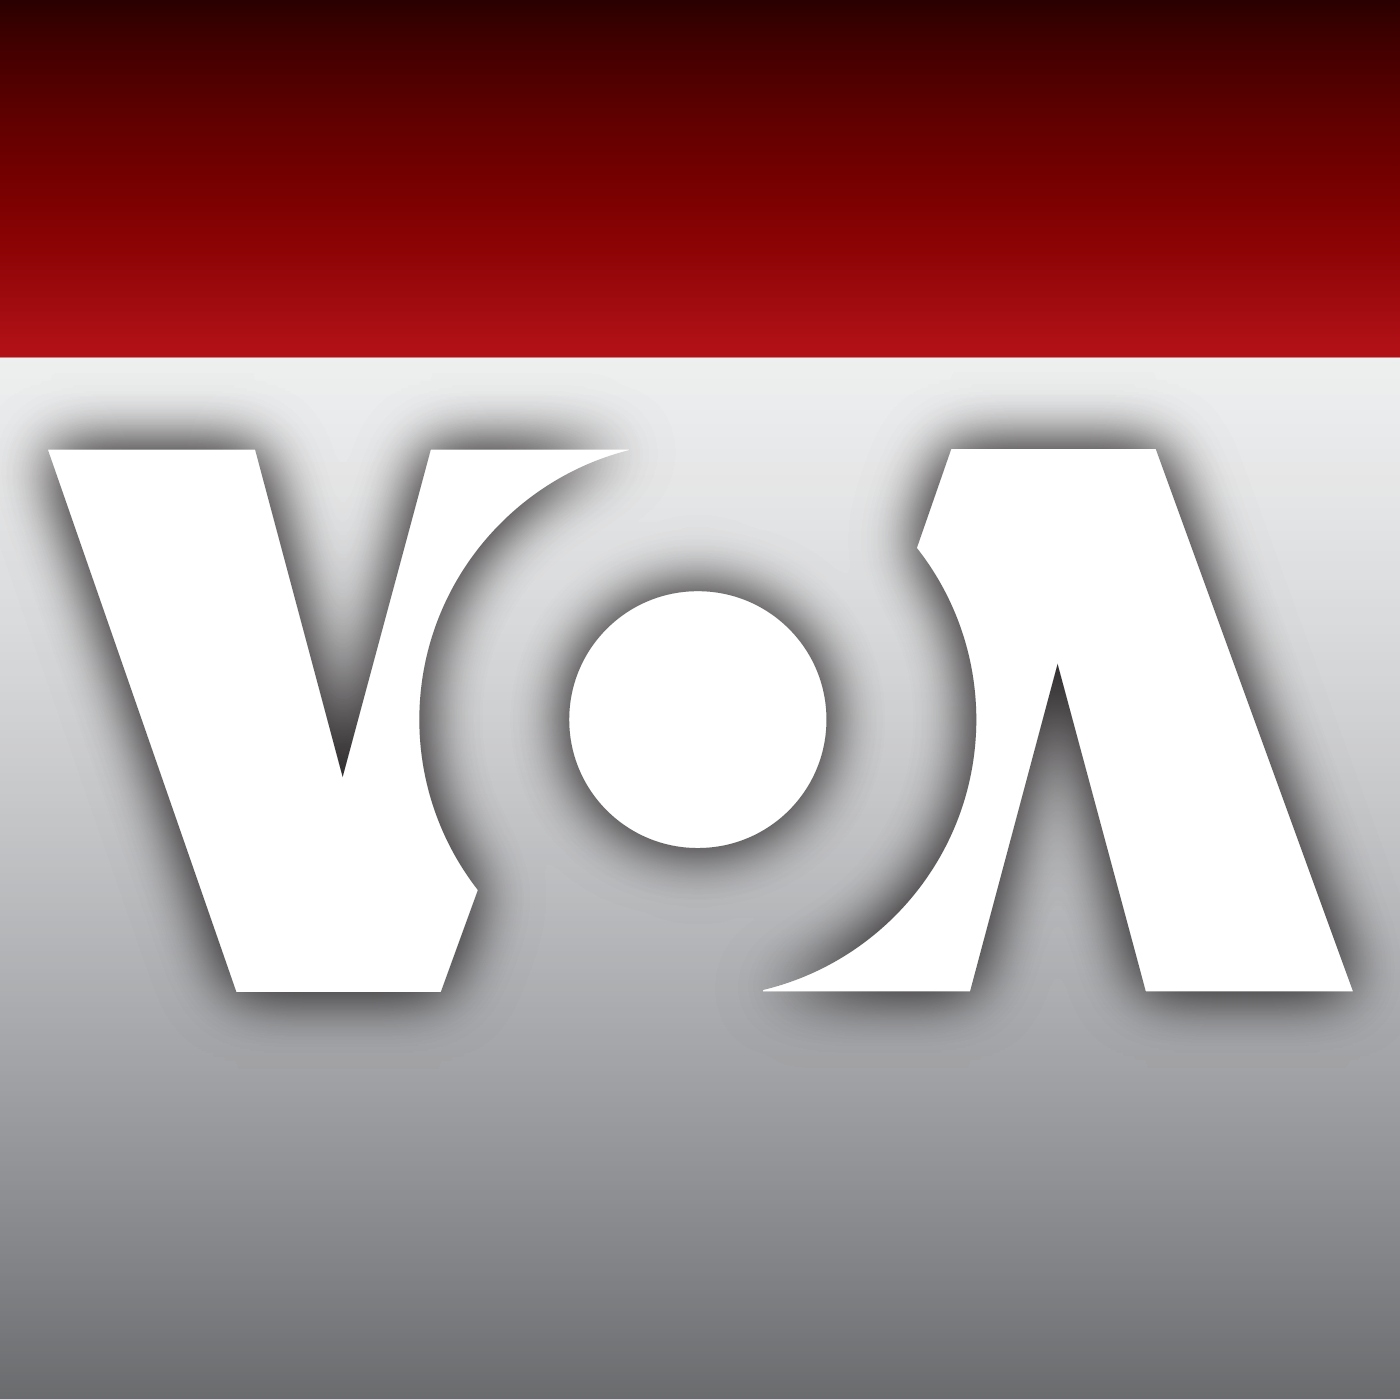 Amakuru ku Mugoroba - 1730 UTC - Voice of America